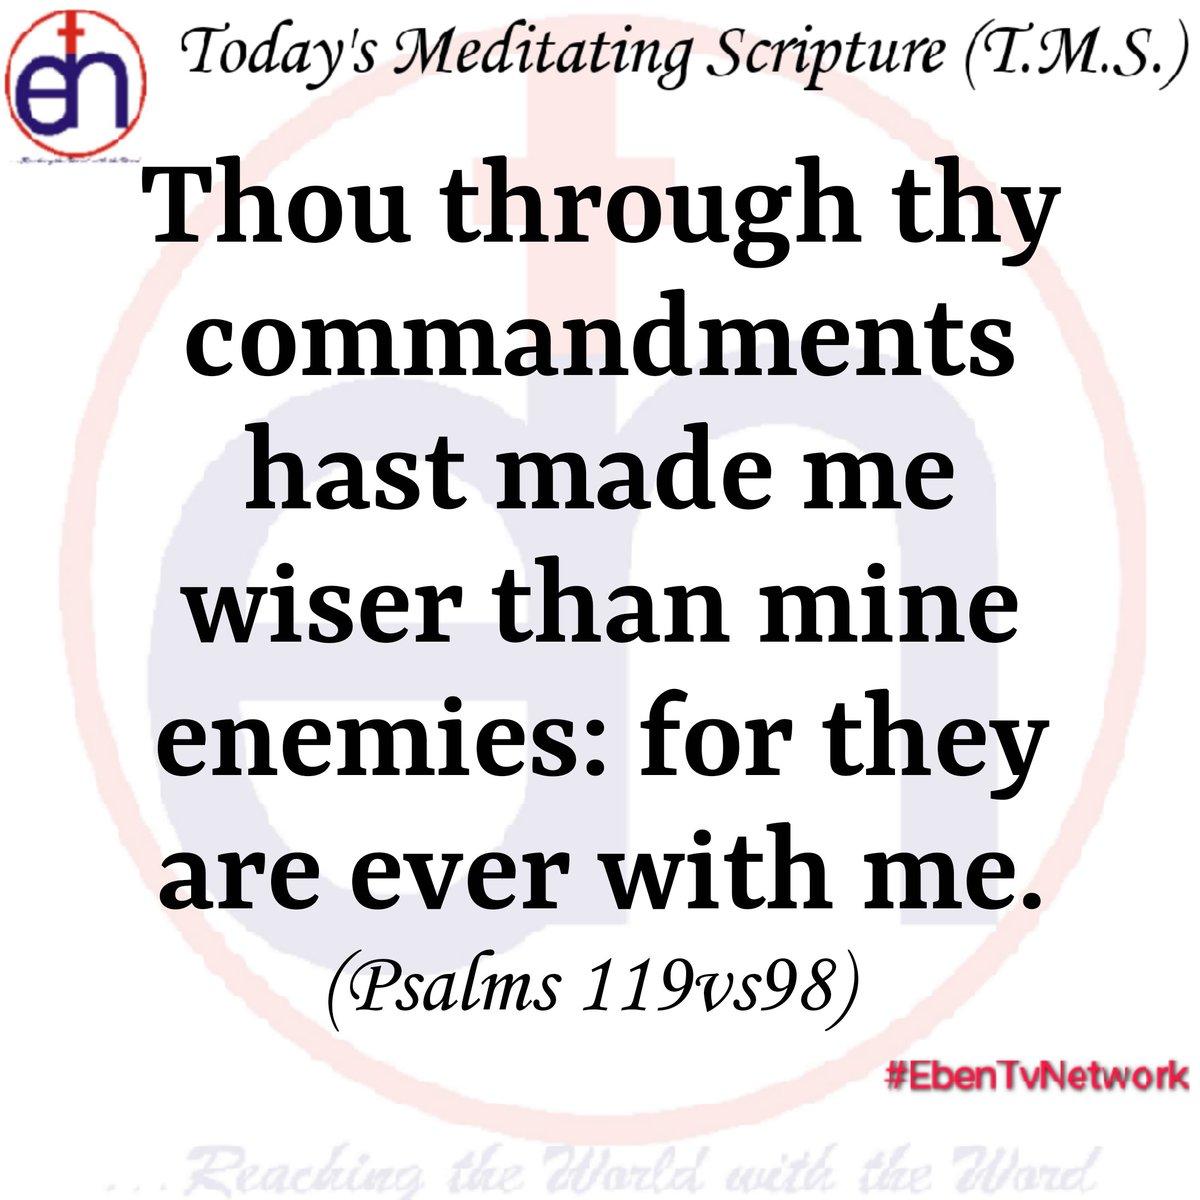 Today's Meditating Scripture (Sunday, 16th February, 2020)  #WordofGod #Bible #Scriptures #Faith #Prayer #EbenTvNetwork #ApostleJoshuaSelman #PastorEAAdeboye  #PastorFoludeboye #gbileakanni #rccg #rccgworldwide #dclm #dlbc #PastorKumuyi #mfm #Gospel #Sword #Bamiloye #GloriaBamilopic.twitter.com/btz2oDFmnY